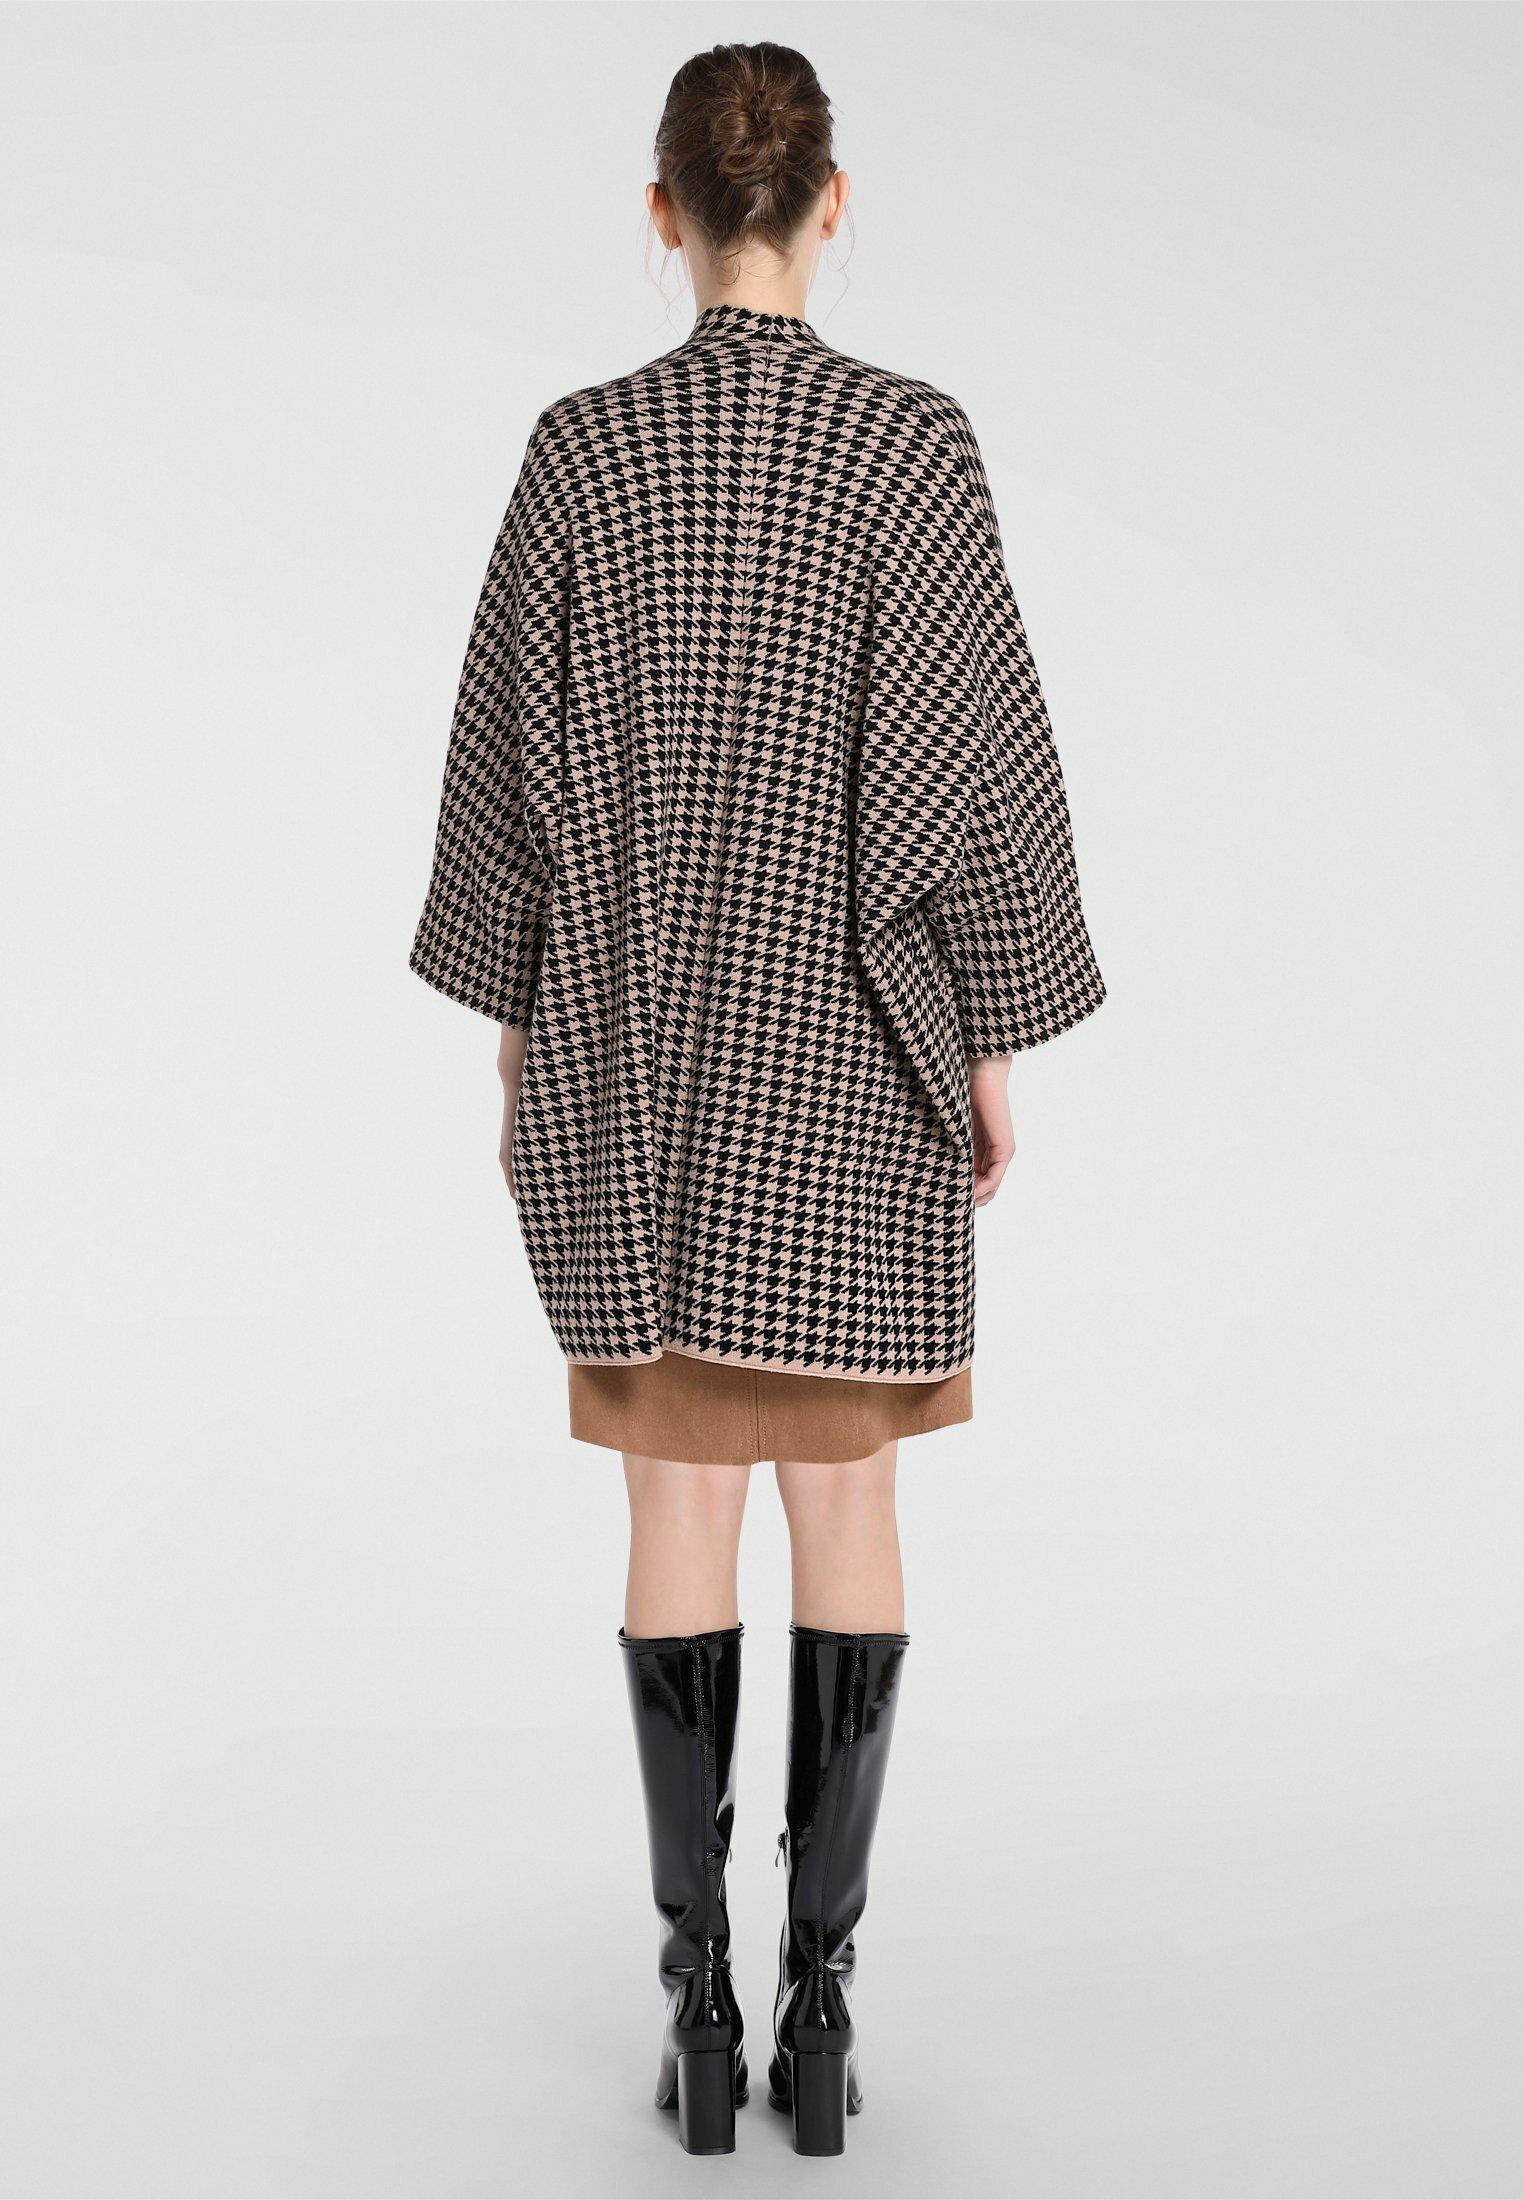 Buy Women's Clothing Apart Cardigan karamell-schwarz 4NUm7CLx7